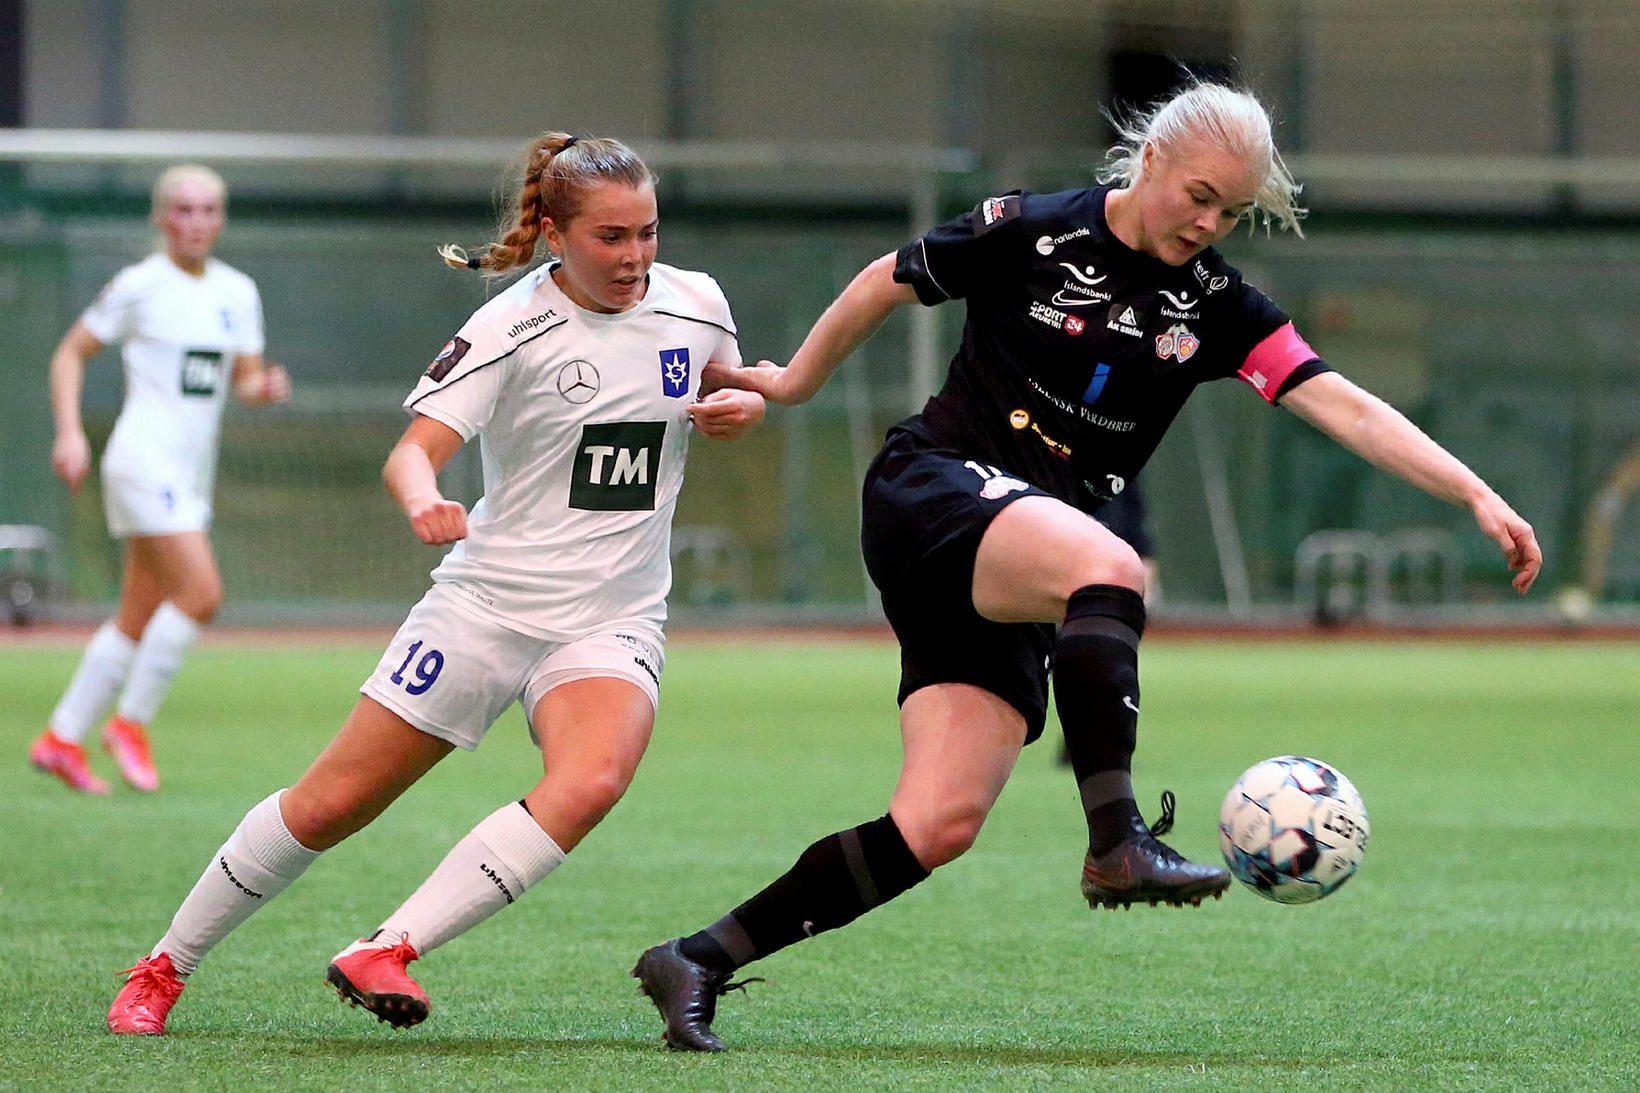 Arna Sif Ásgrímsdóttir